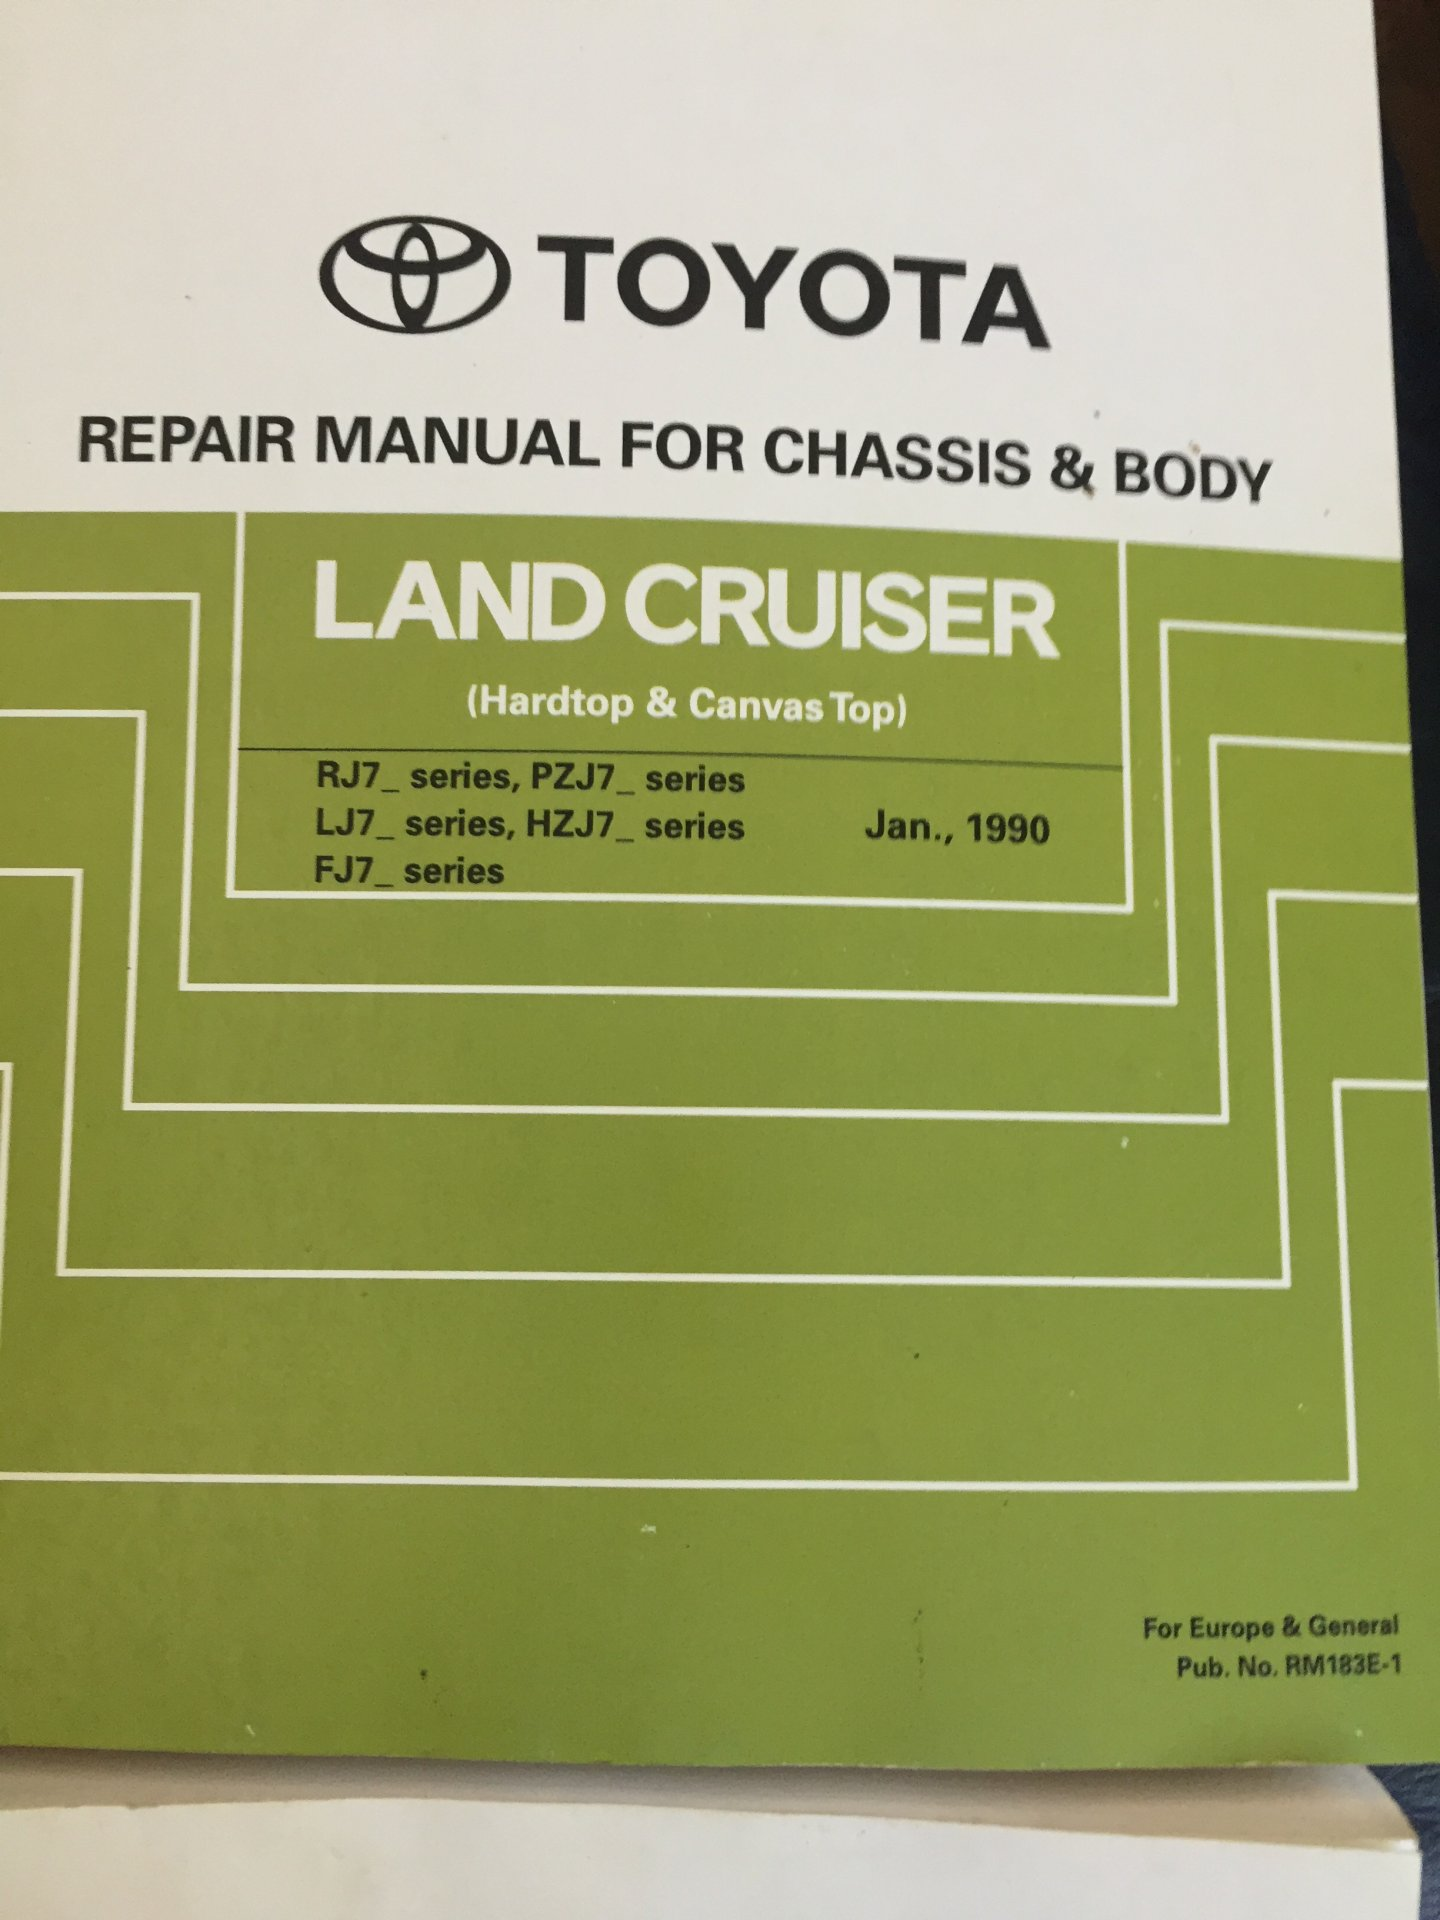 1990 Toyota manuals 002.JPG